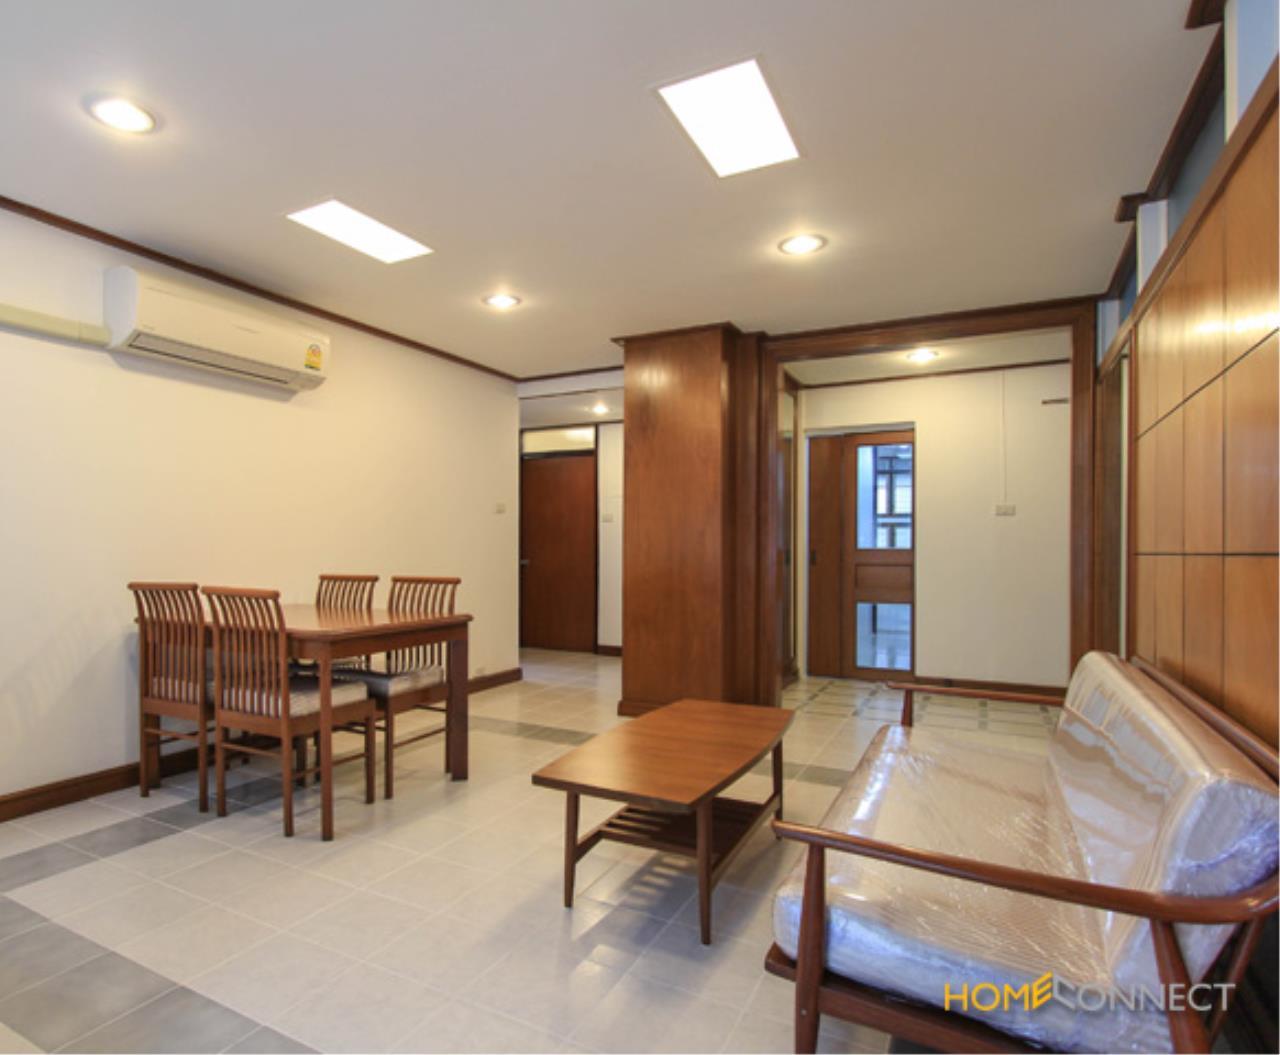 Home Connect Thailand Agency's C.S Villa Condominium for Rent 1